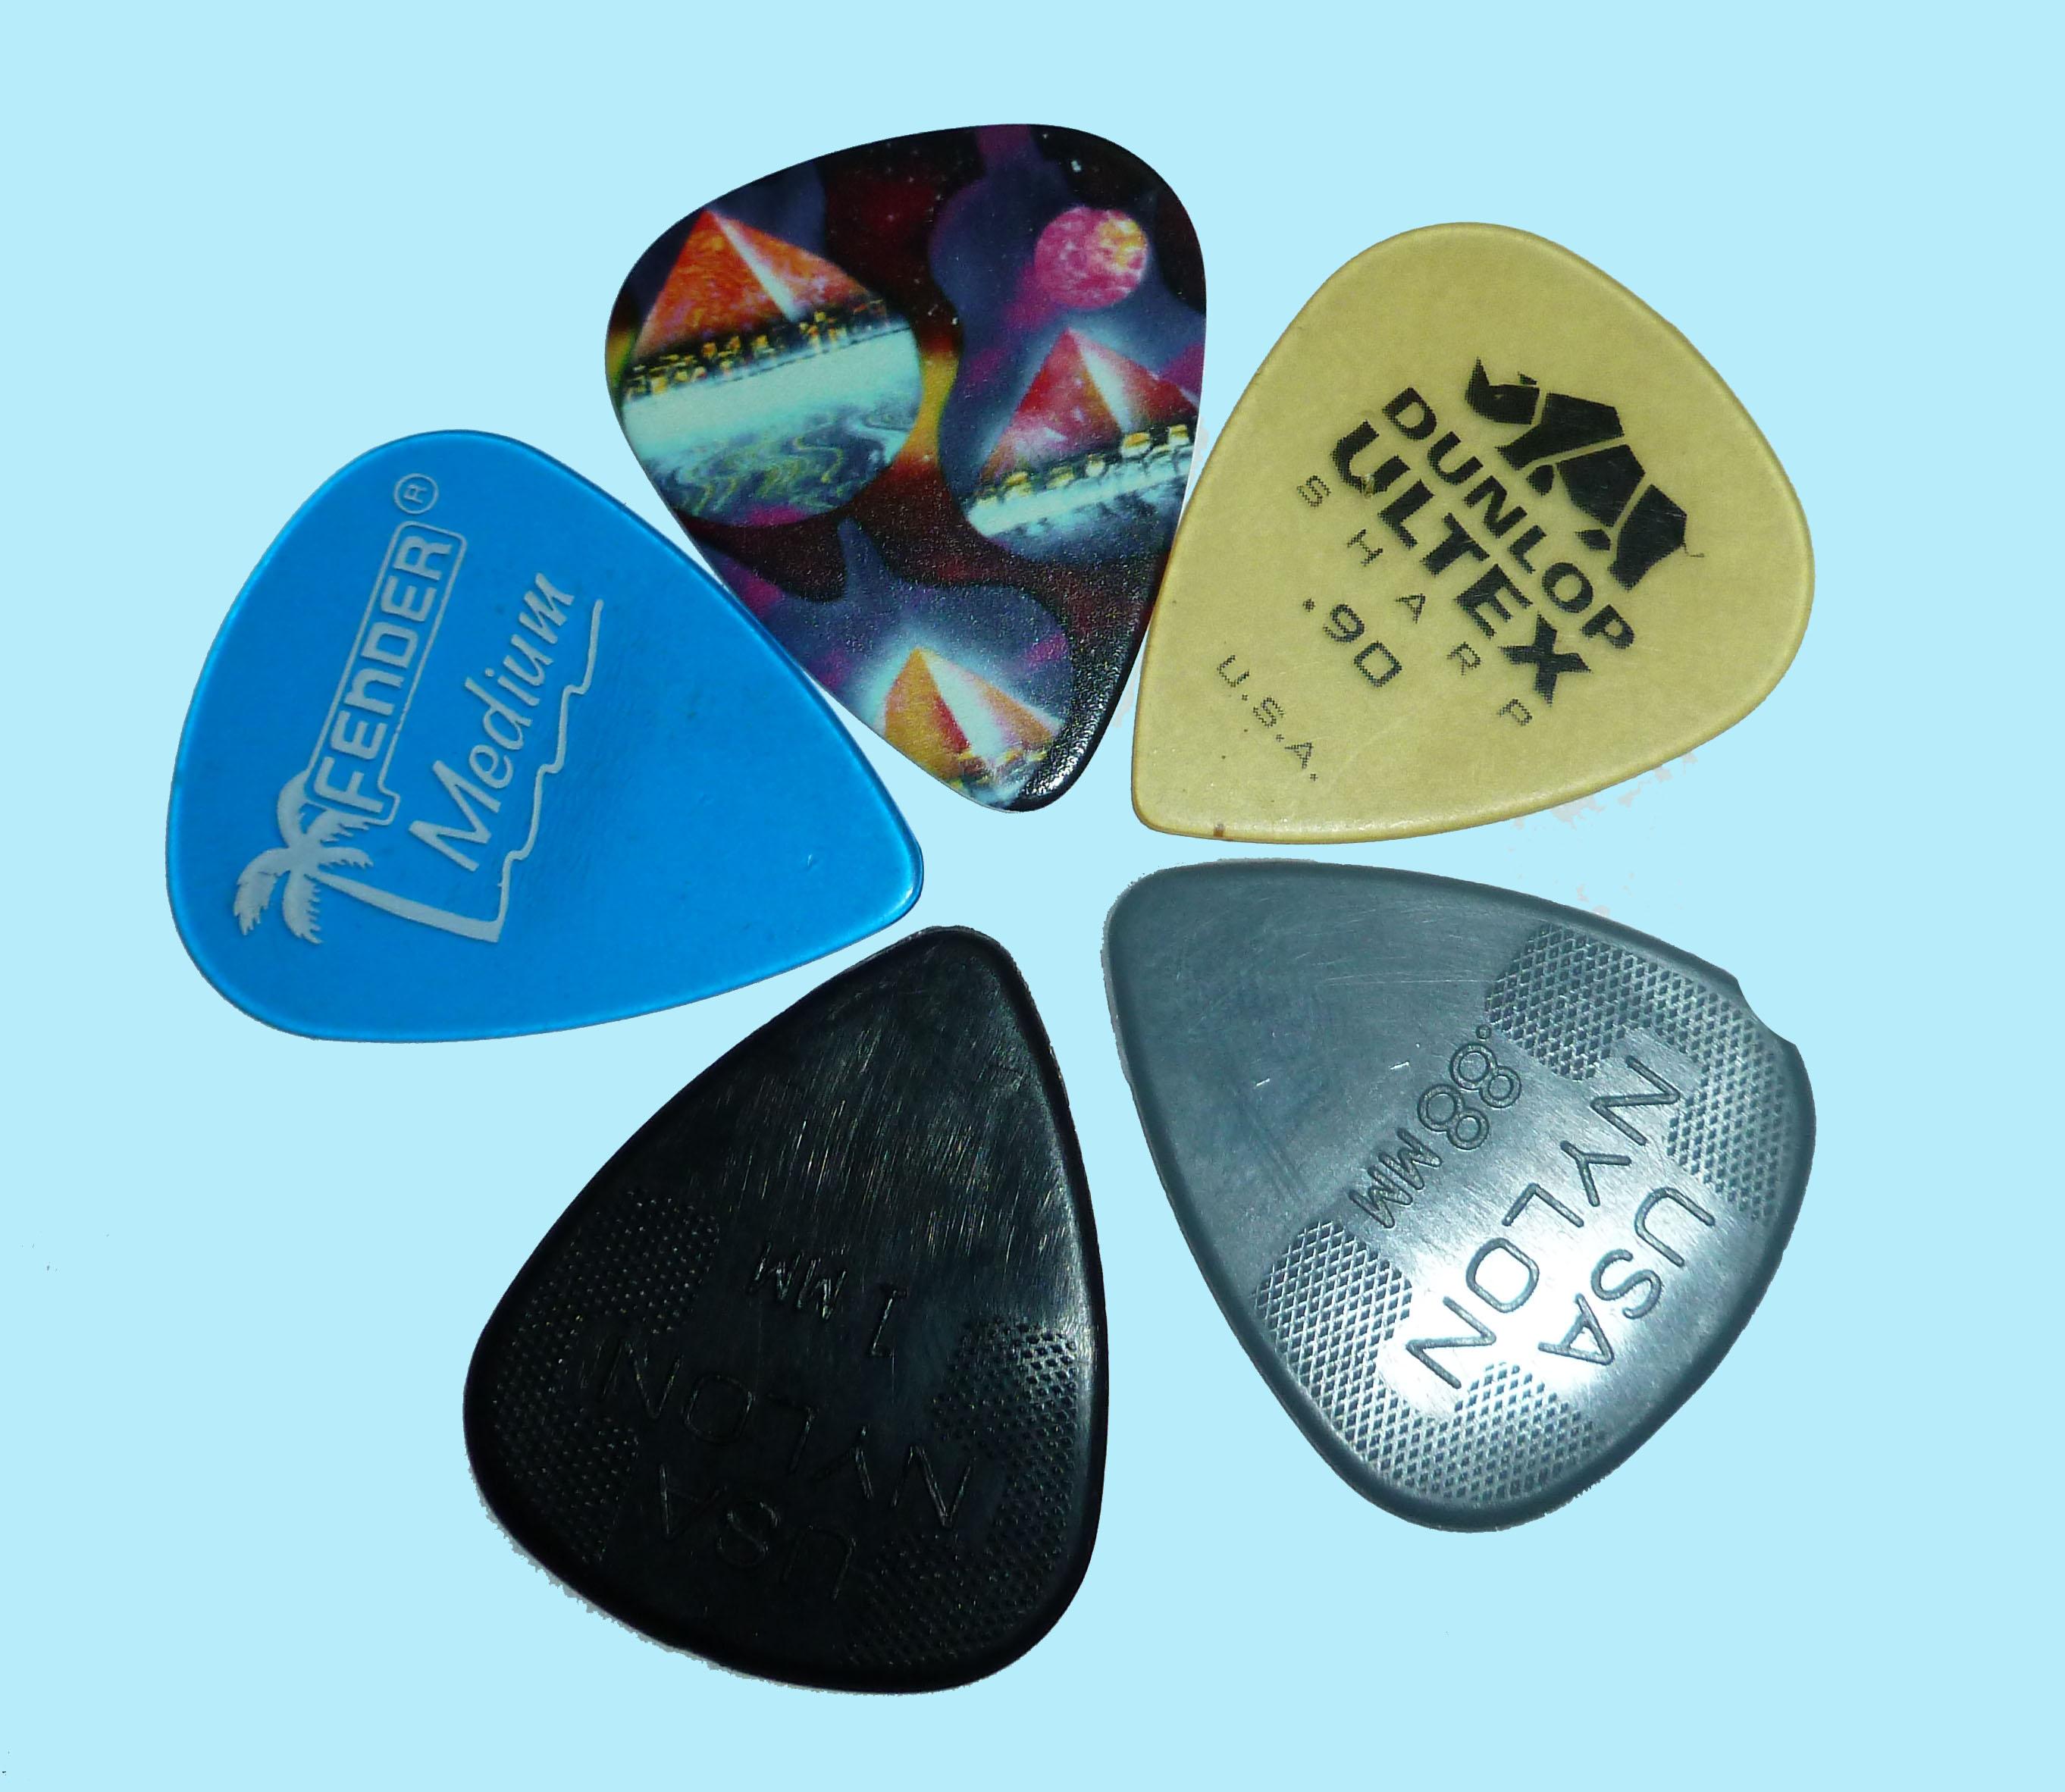 guitar pick sample by Susan L. amrsh